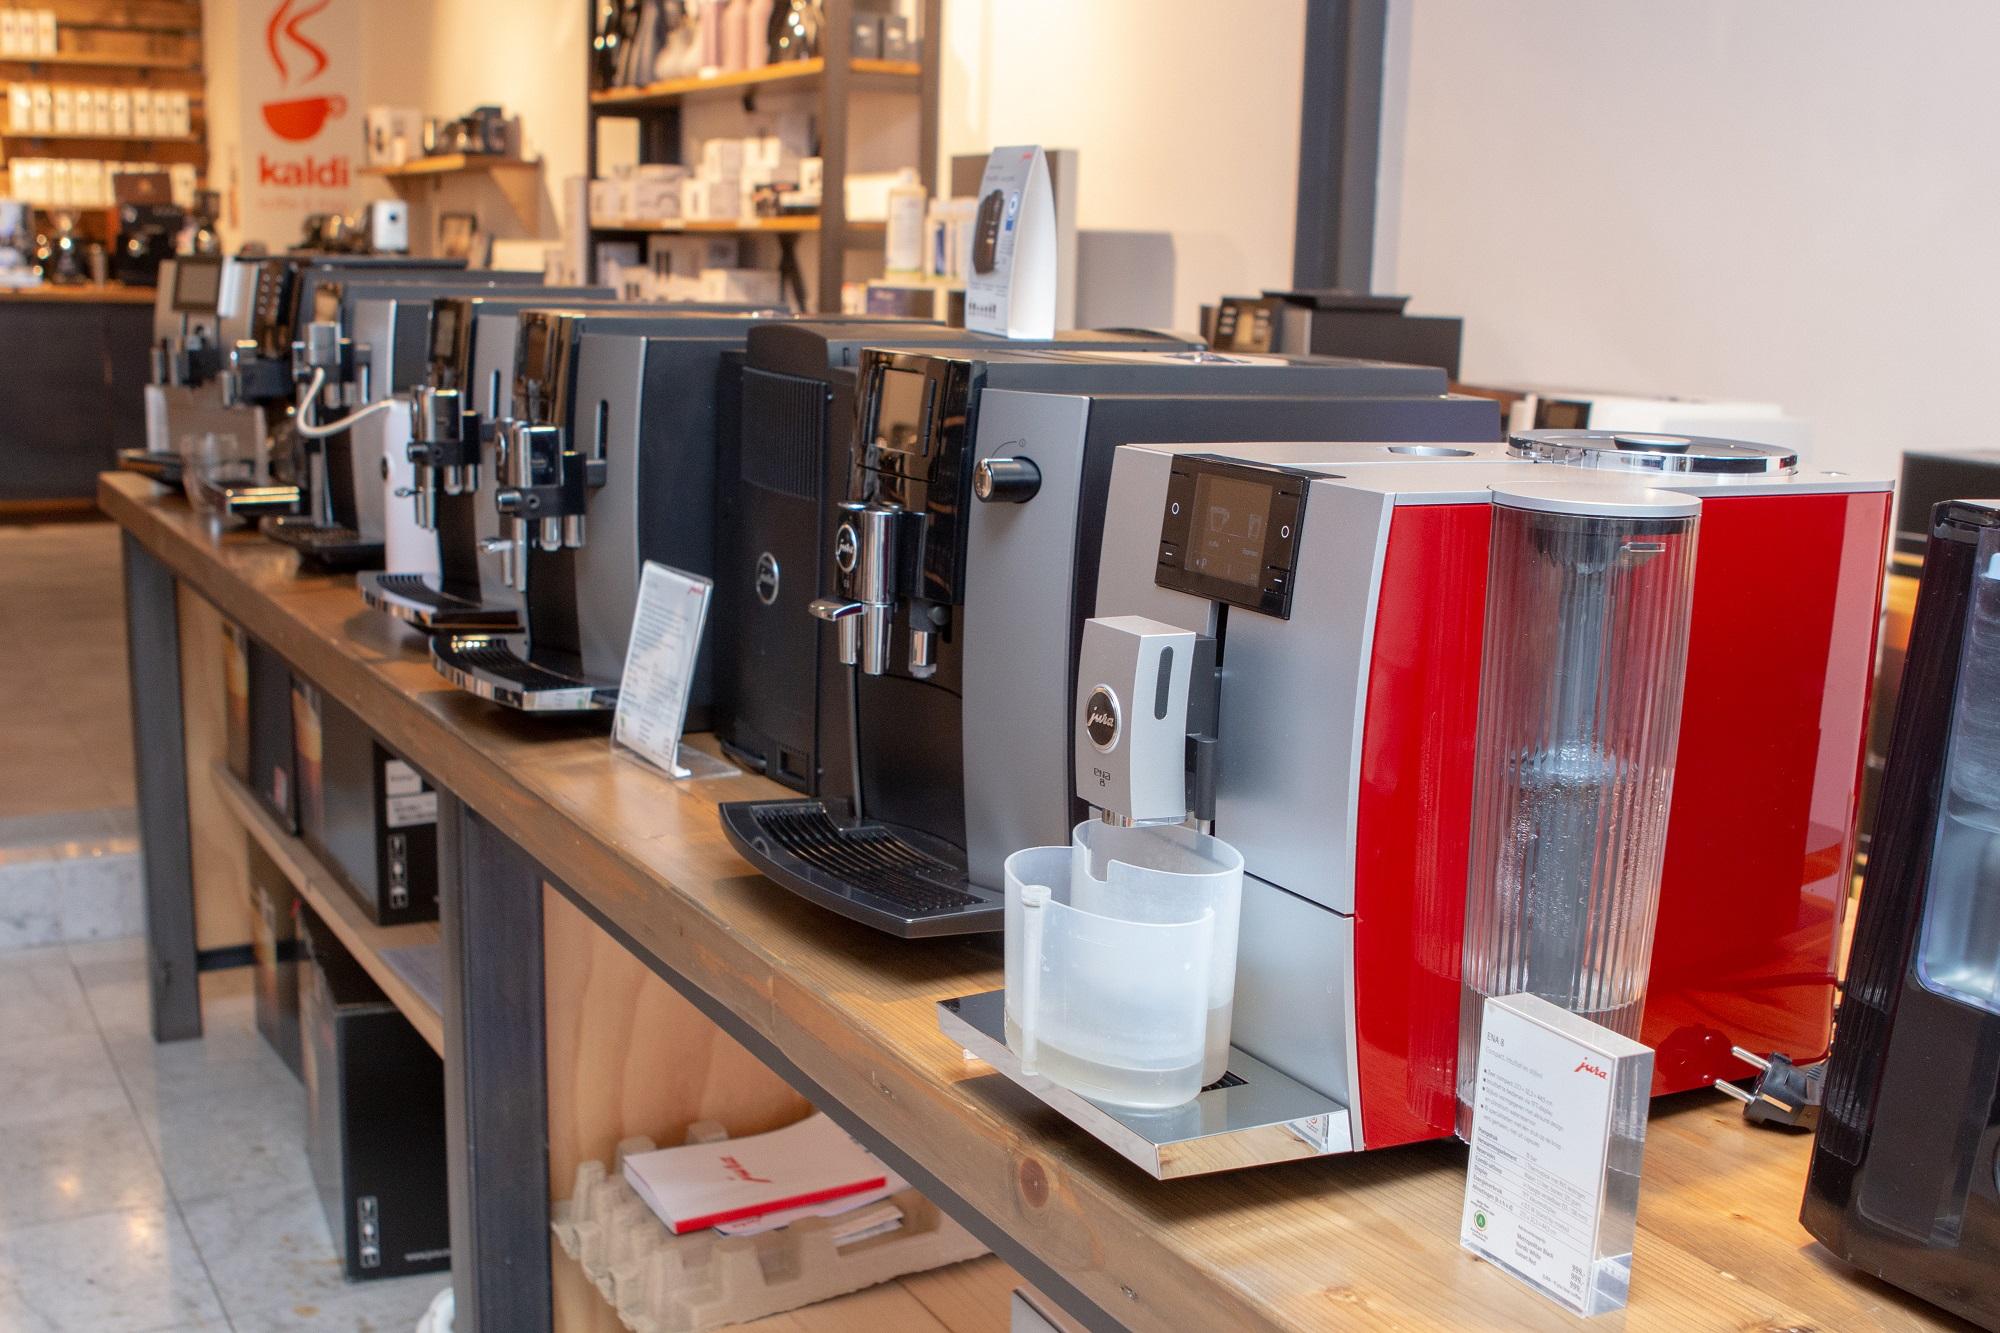 koffiecadeau kaldi espressoapparaten kaldi kaldi acties bergen op zoom koffie koffiemachine cadeau koffiebonen cappuccino koffiebar